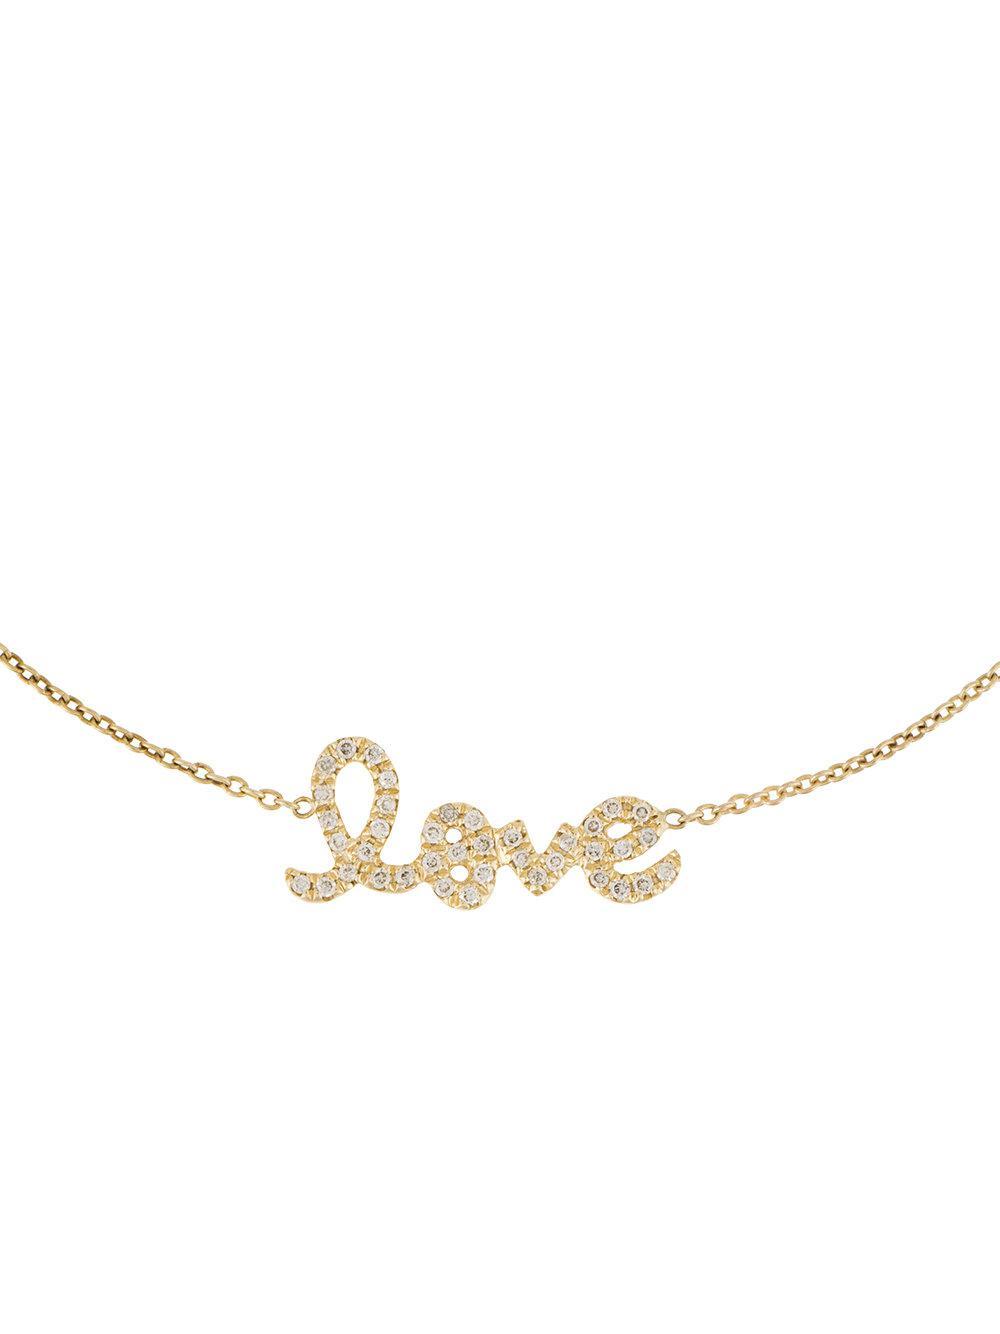 Sydney Evan 14kt yellow gold diamond love bracelet - Metallic oqKpDG